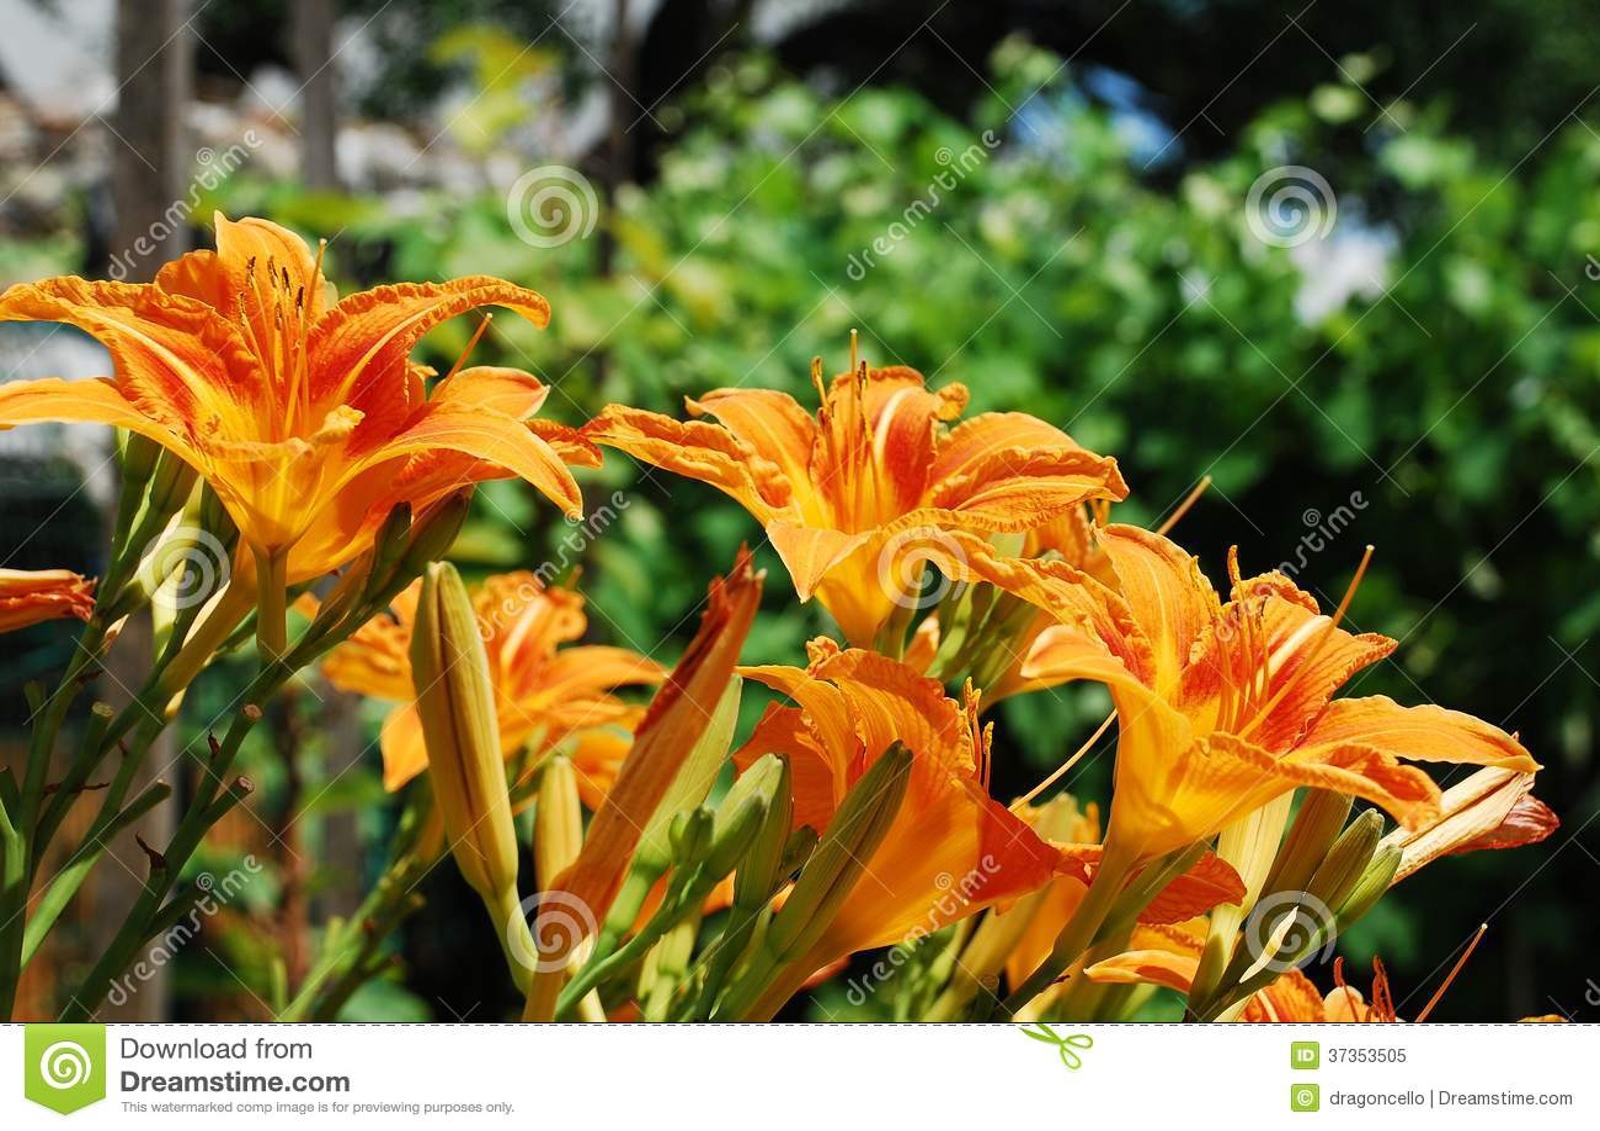 Wild Orange Lilies Stock Image Image Of Orange Flowers 37353505